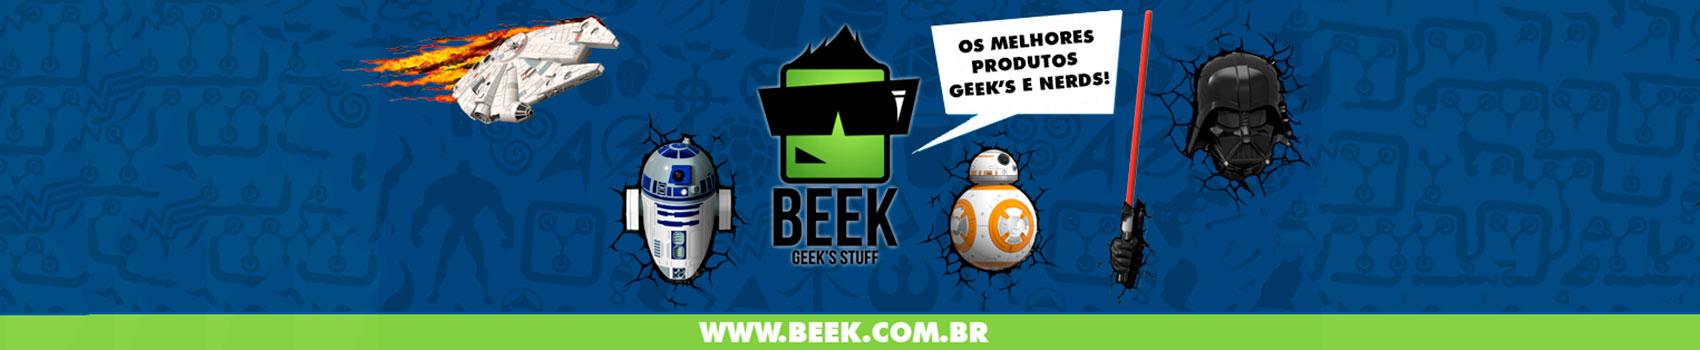 Beek Geek's Stuff